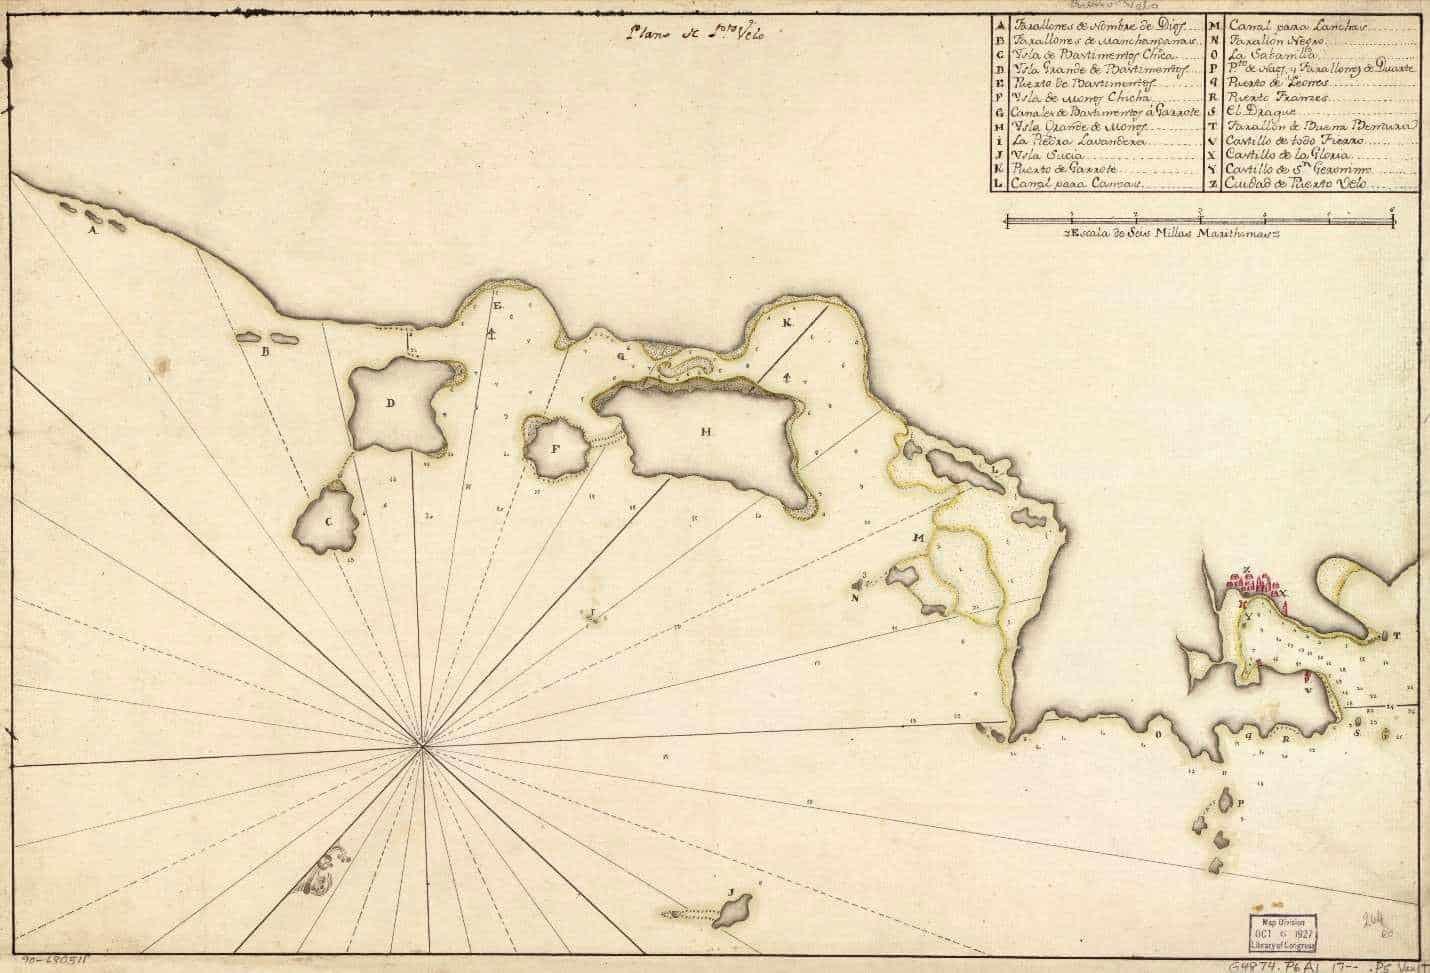 Spanish Map Circa 1700 Showing the Islas Bastimentos (C & D) at Left and Portobello at Right.